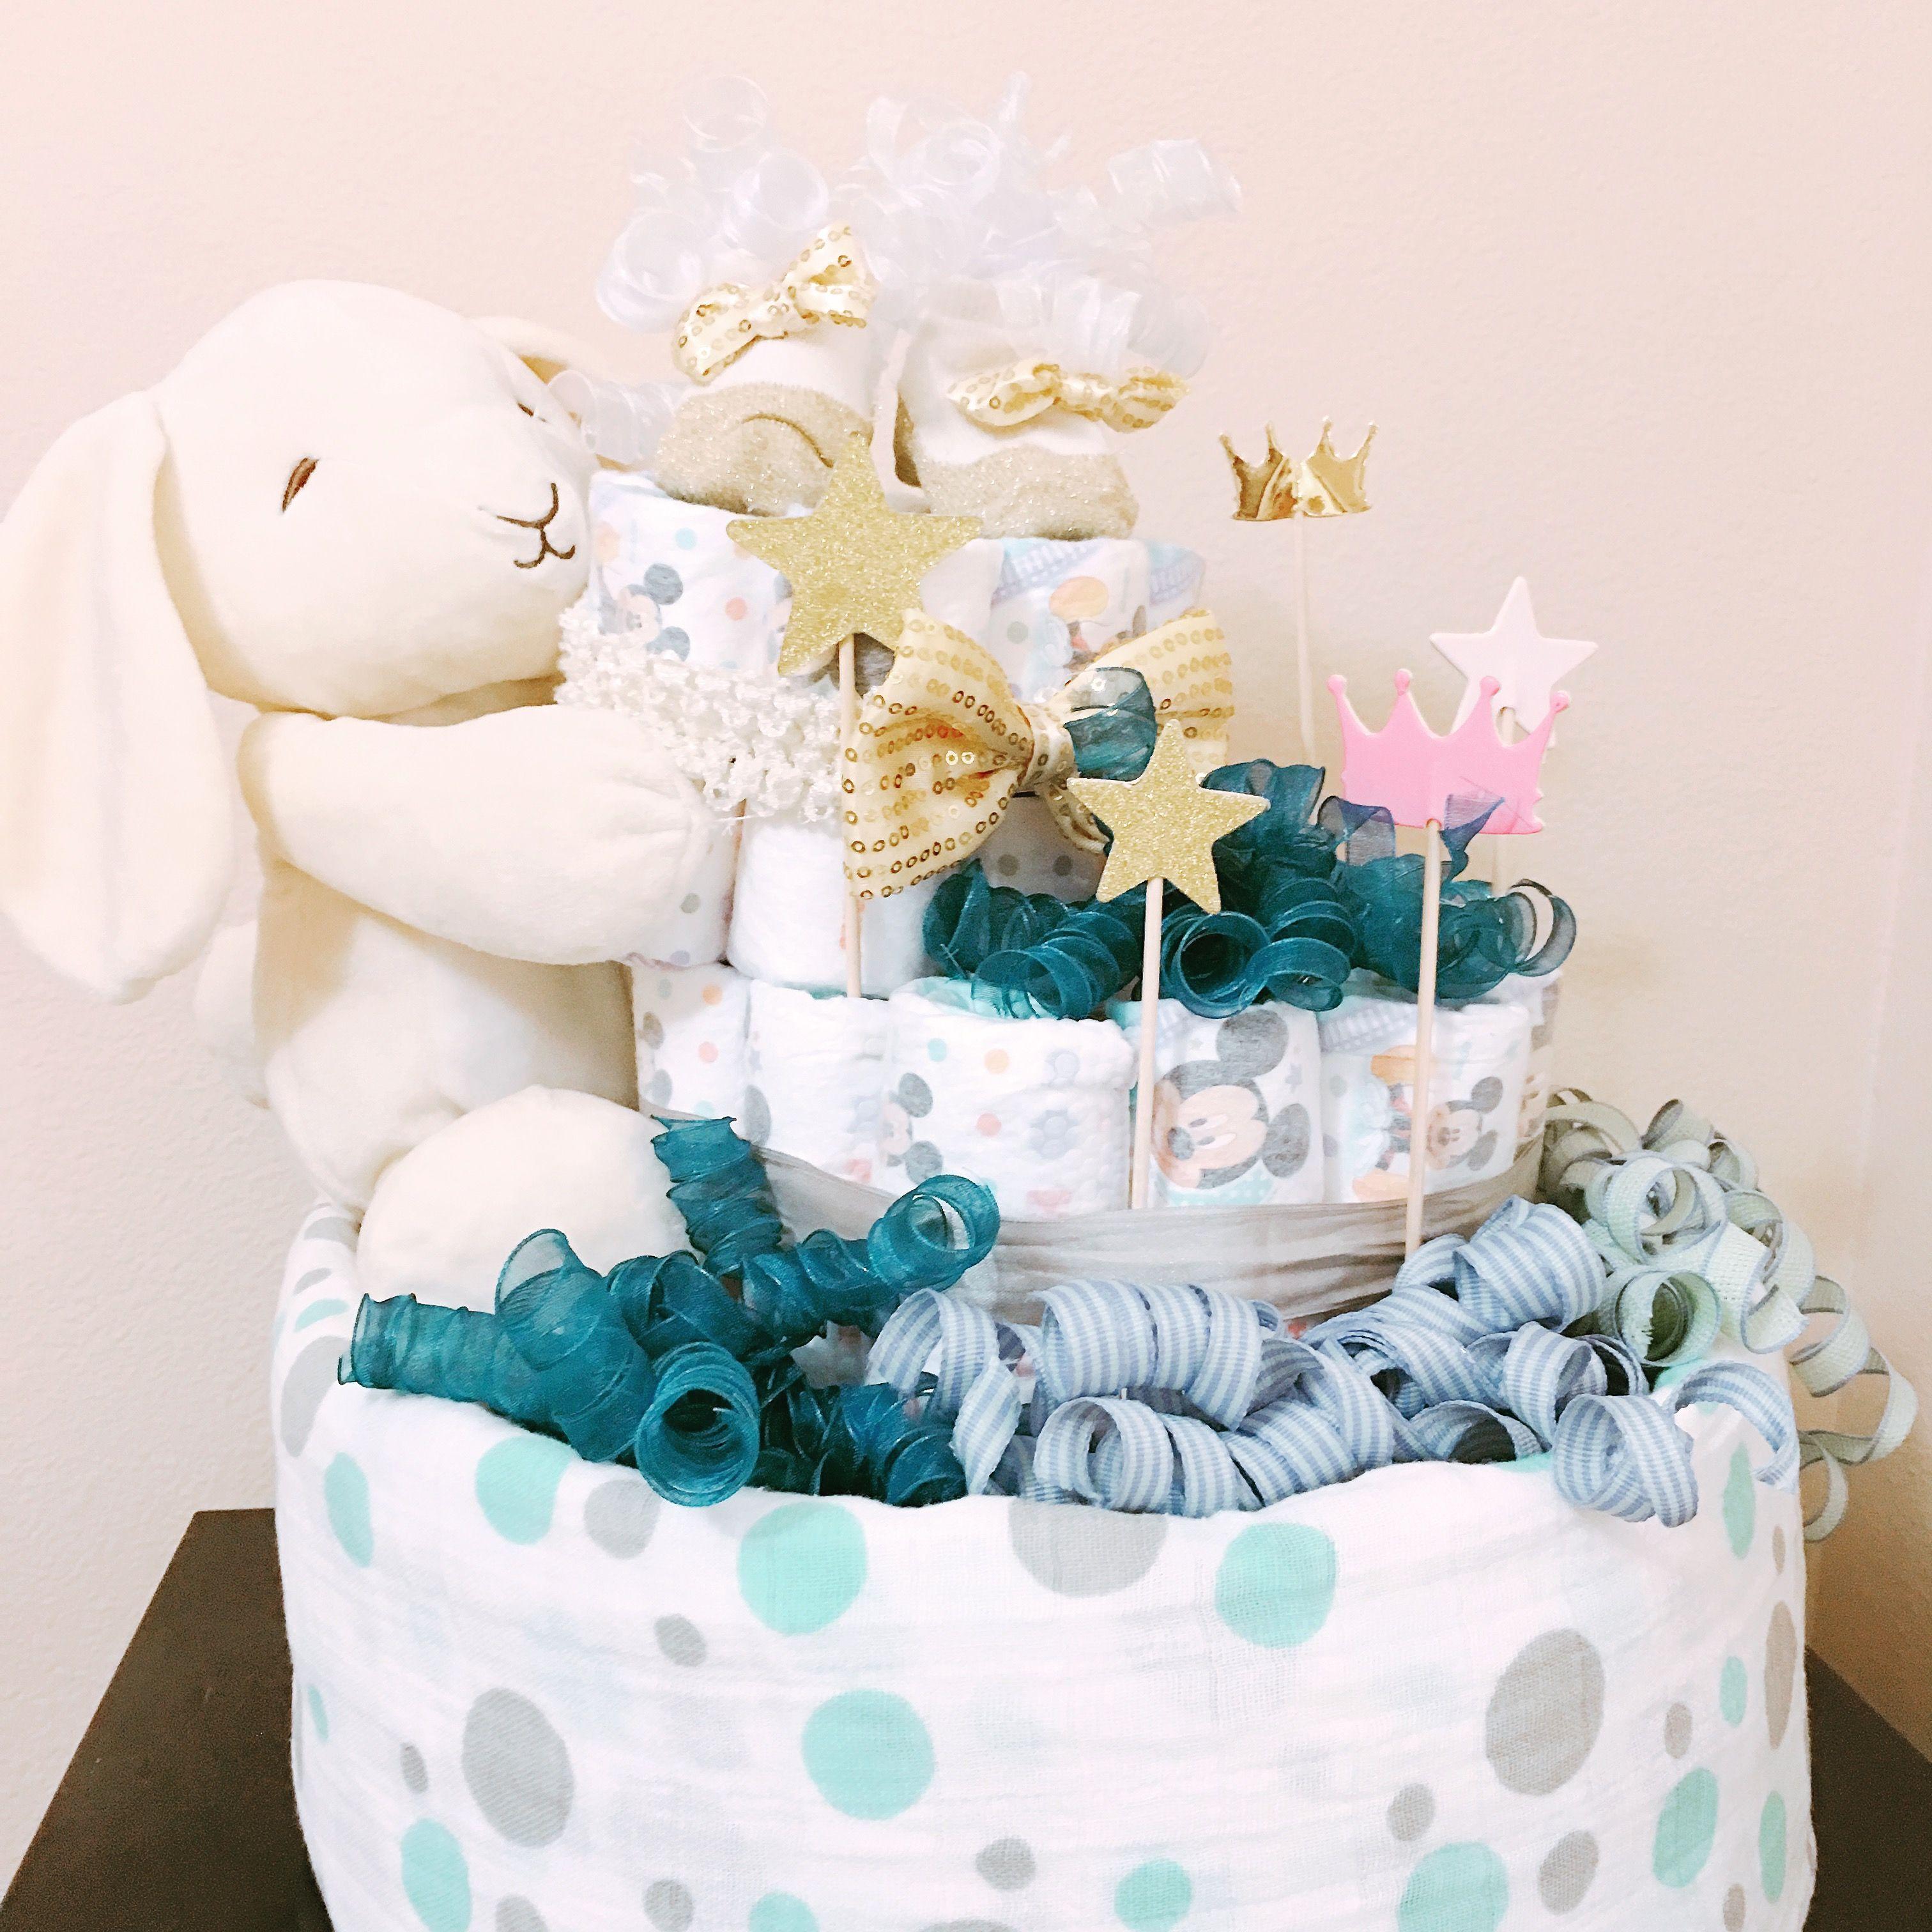 Bunny Diaper Cake for Baby Boy